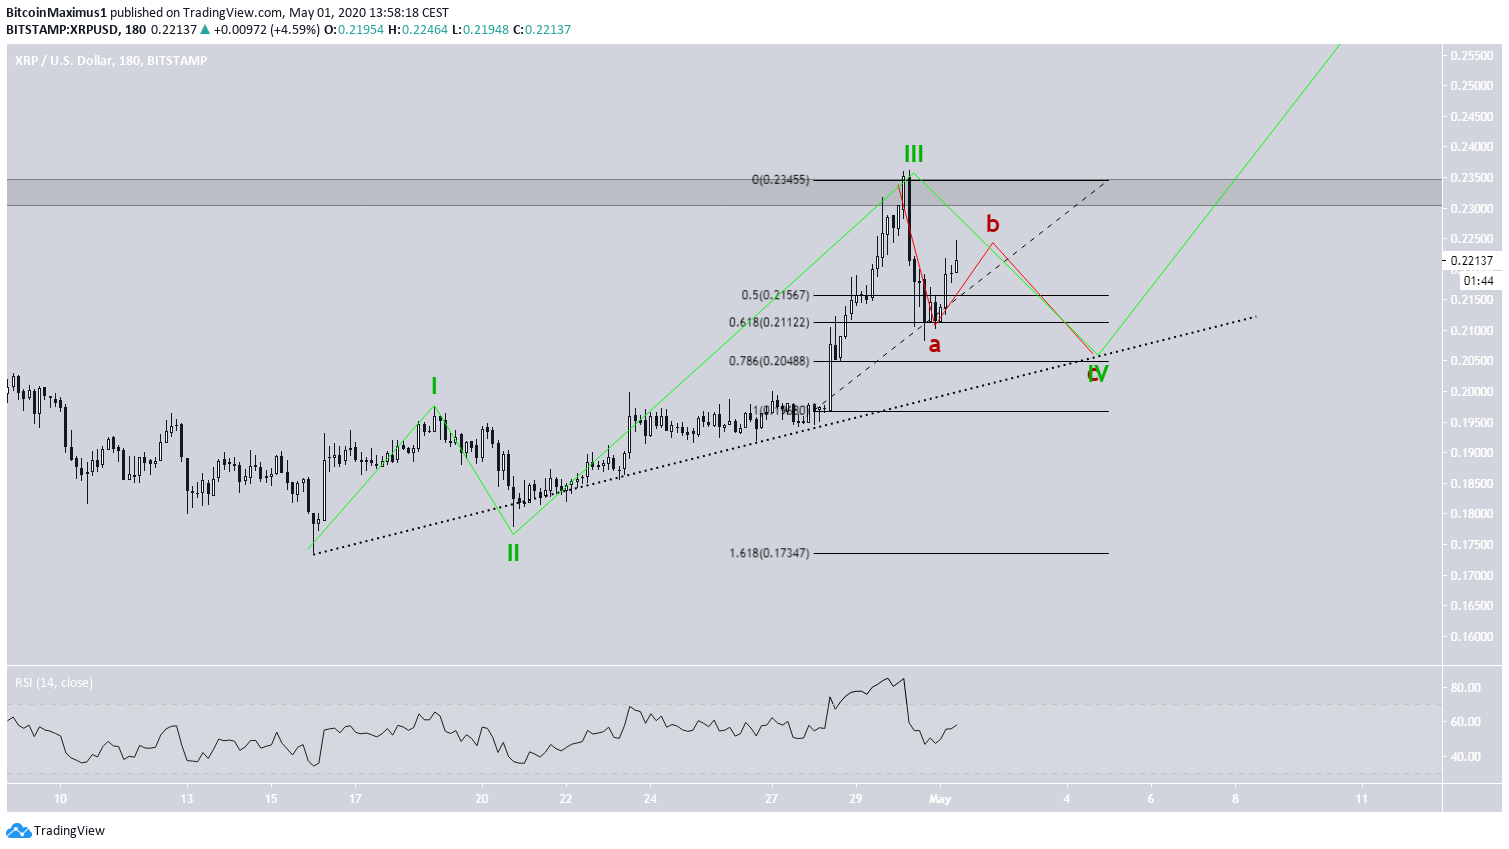 XRP Price Movement